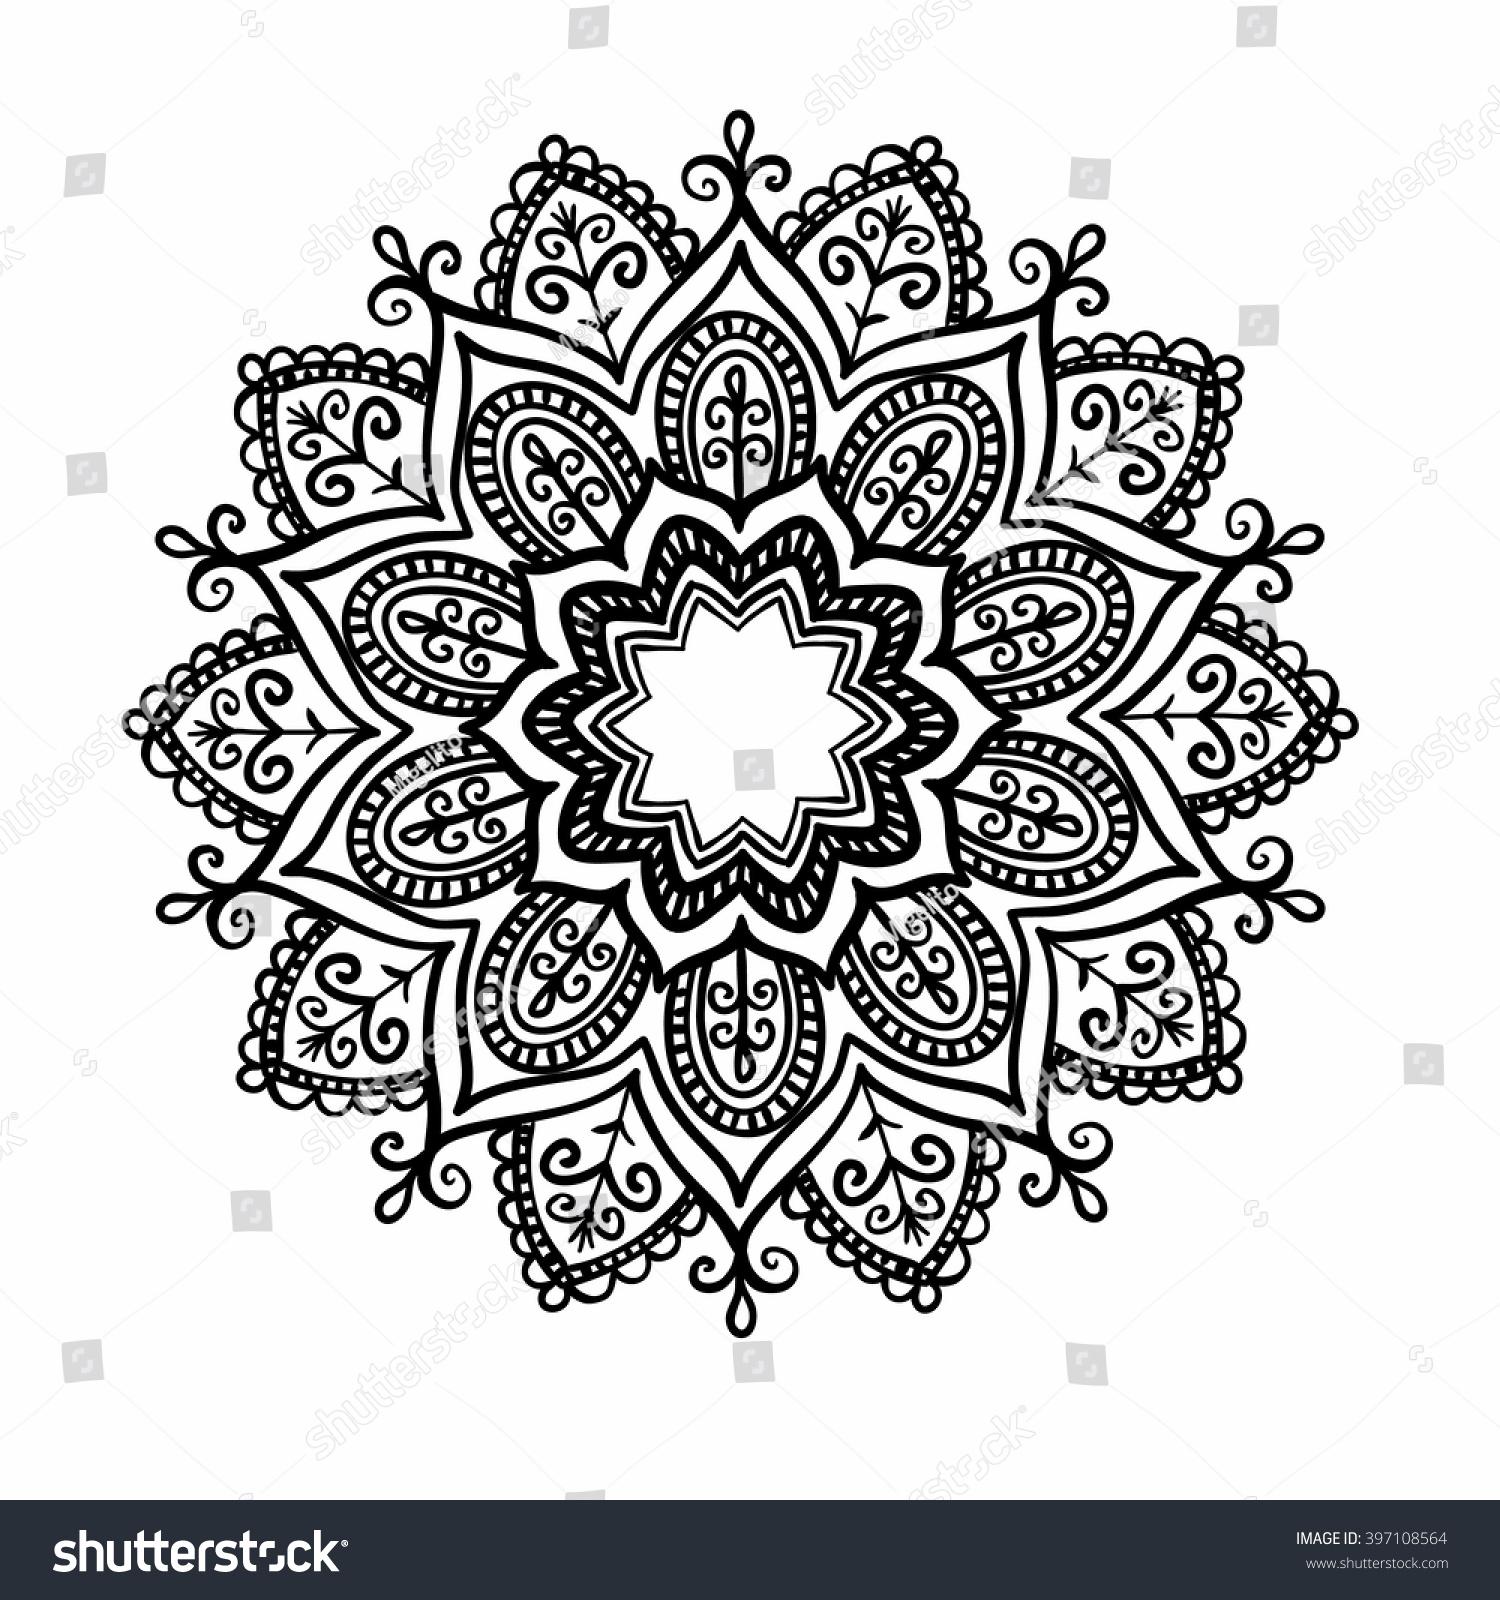 ornamental round pattern floral elements smart stock vector 397108564 shutterstock. Black Bedroom Furniture Sets. Home Design Ideas